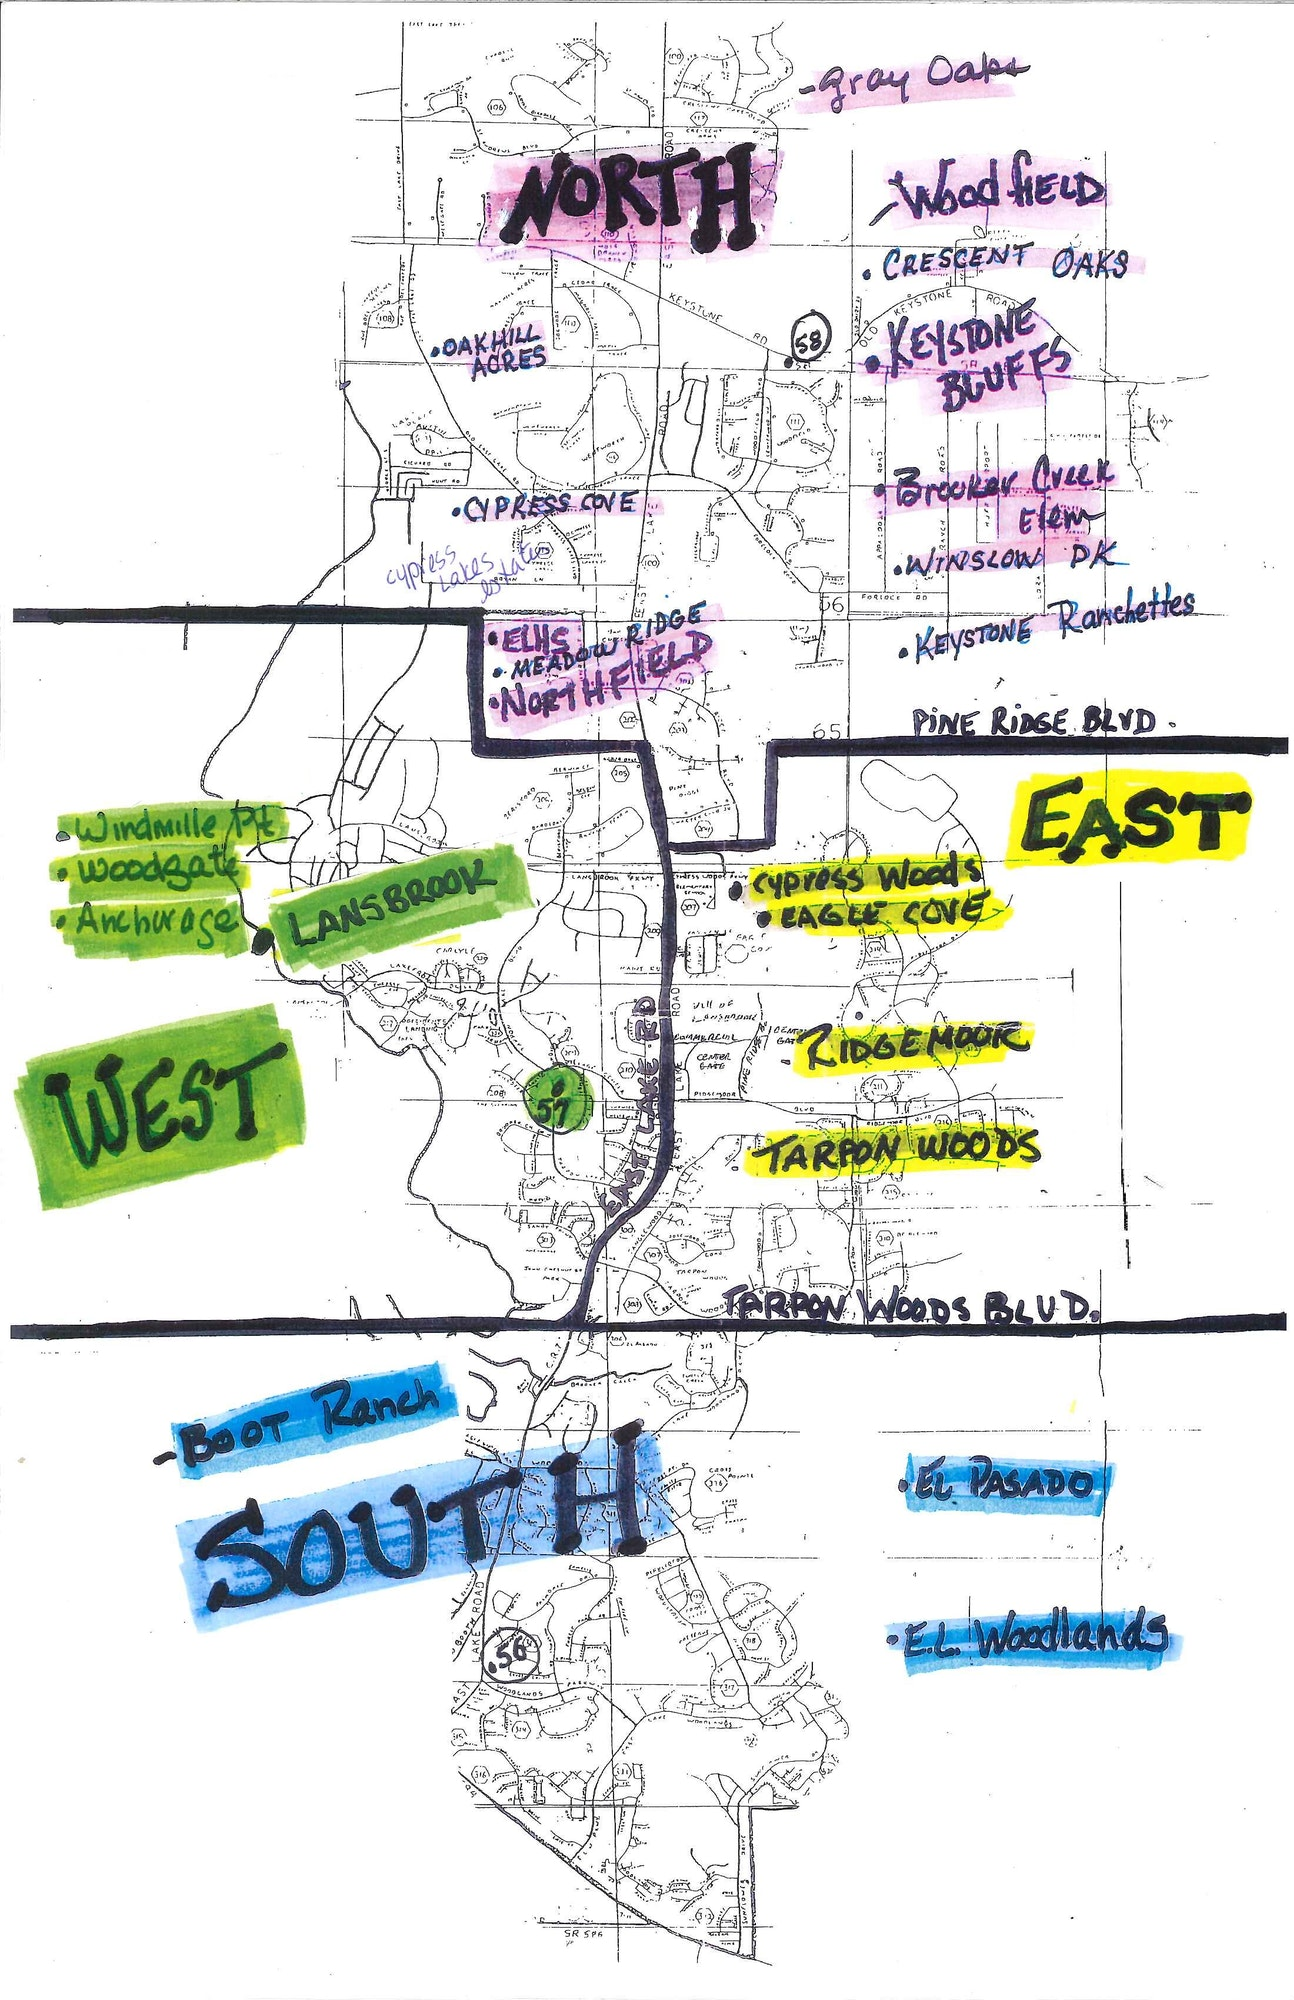 May contain: plan, plot, and diagram